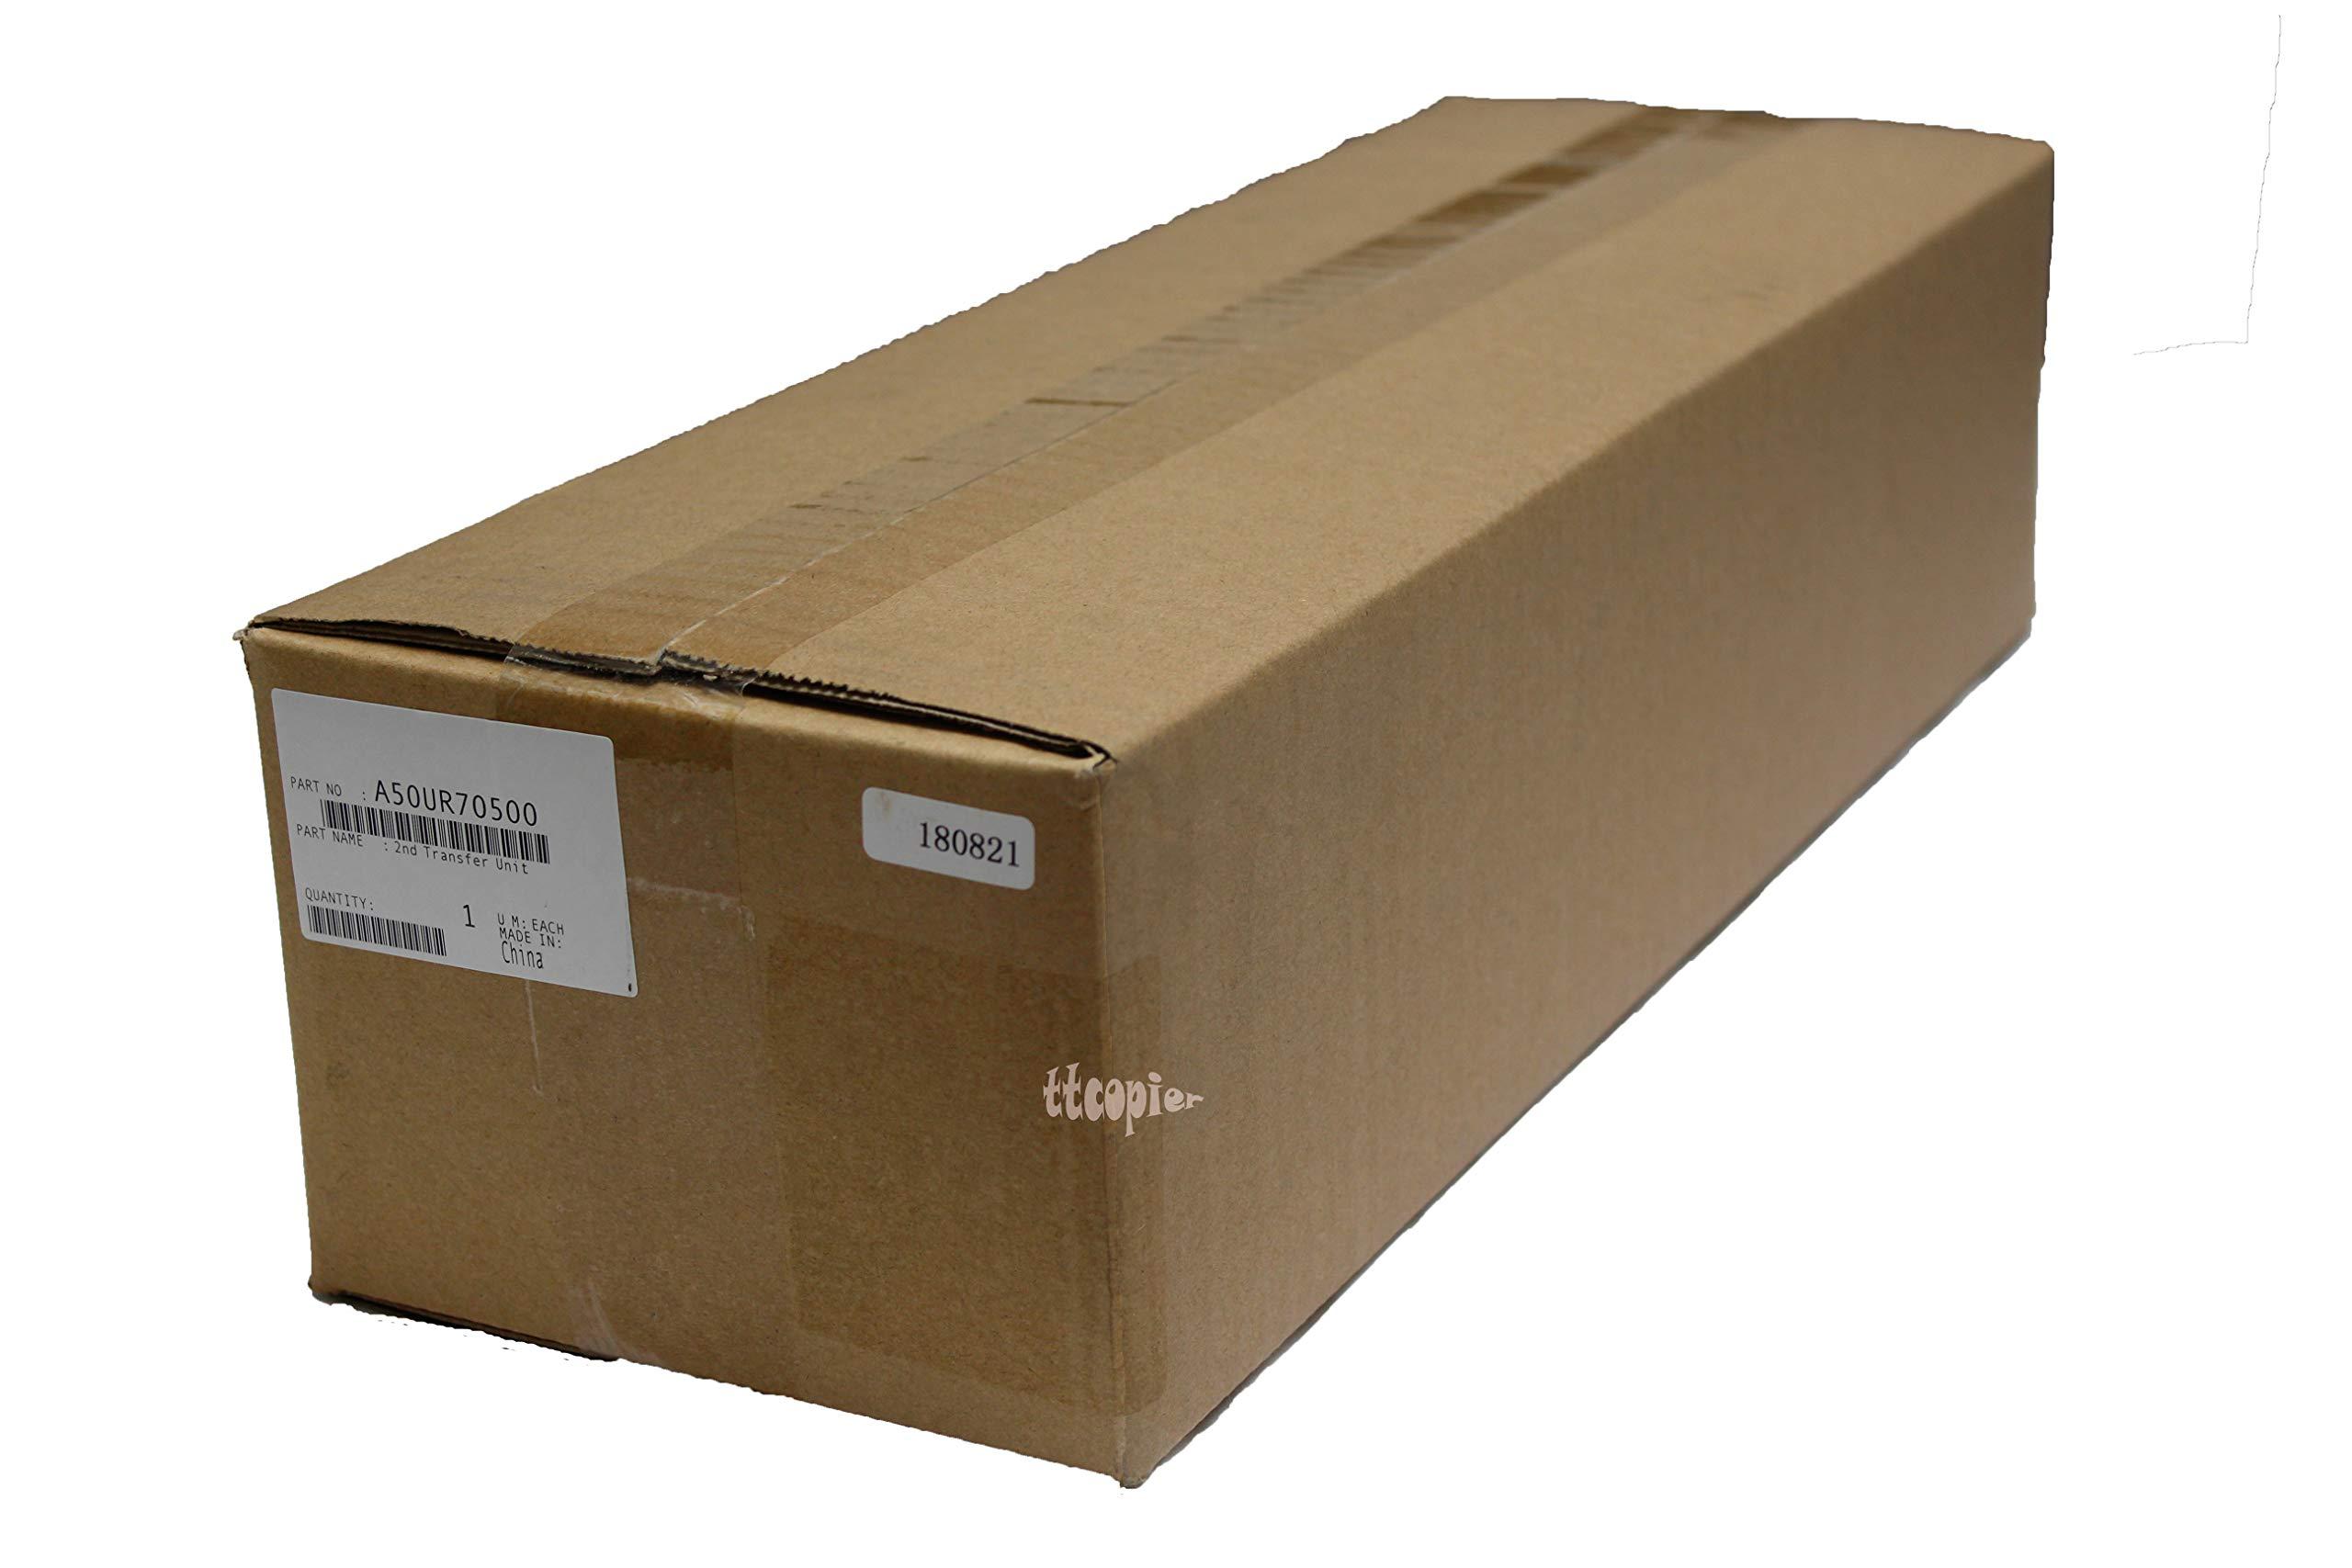 Genuine Konica Minolta A50UR70500 A5OUR7O5OO 2nd Transfer Unit for C1070 C1060